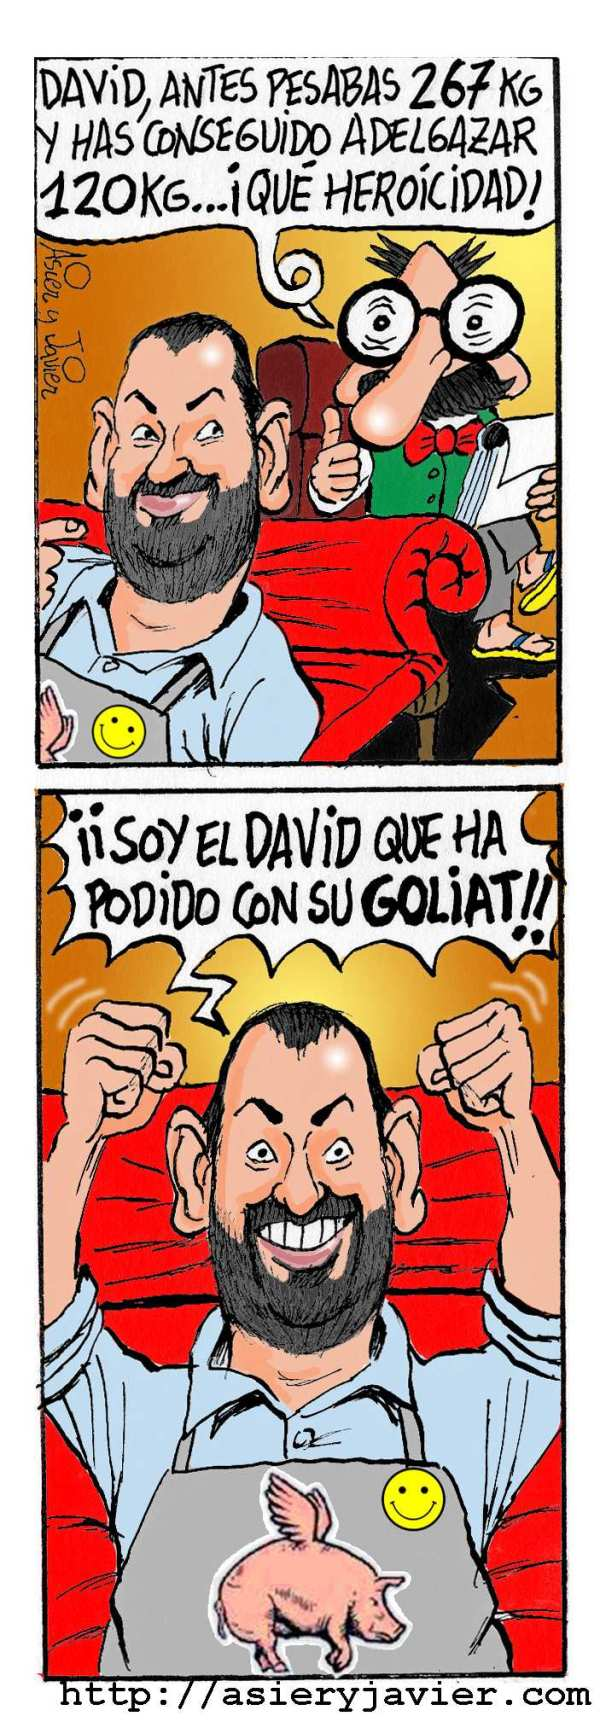 El gran David de Jorge vence a su Goliath. Humor, caricatura.